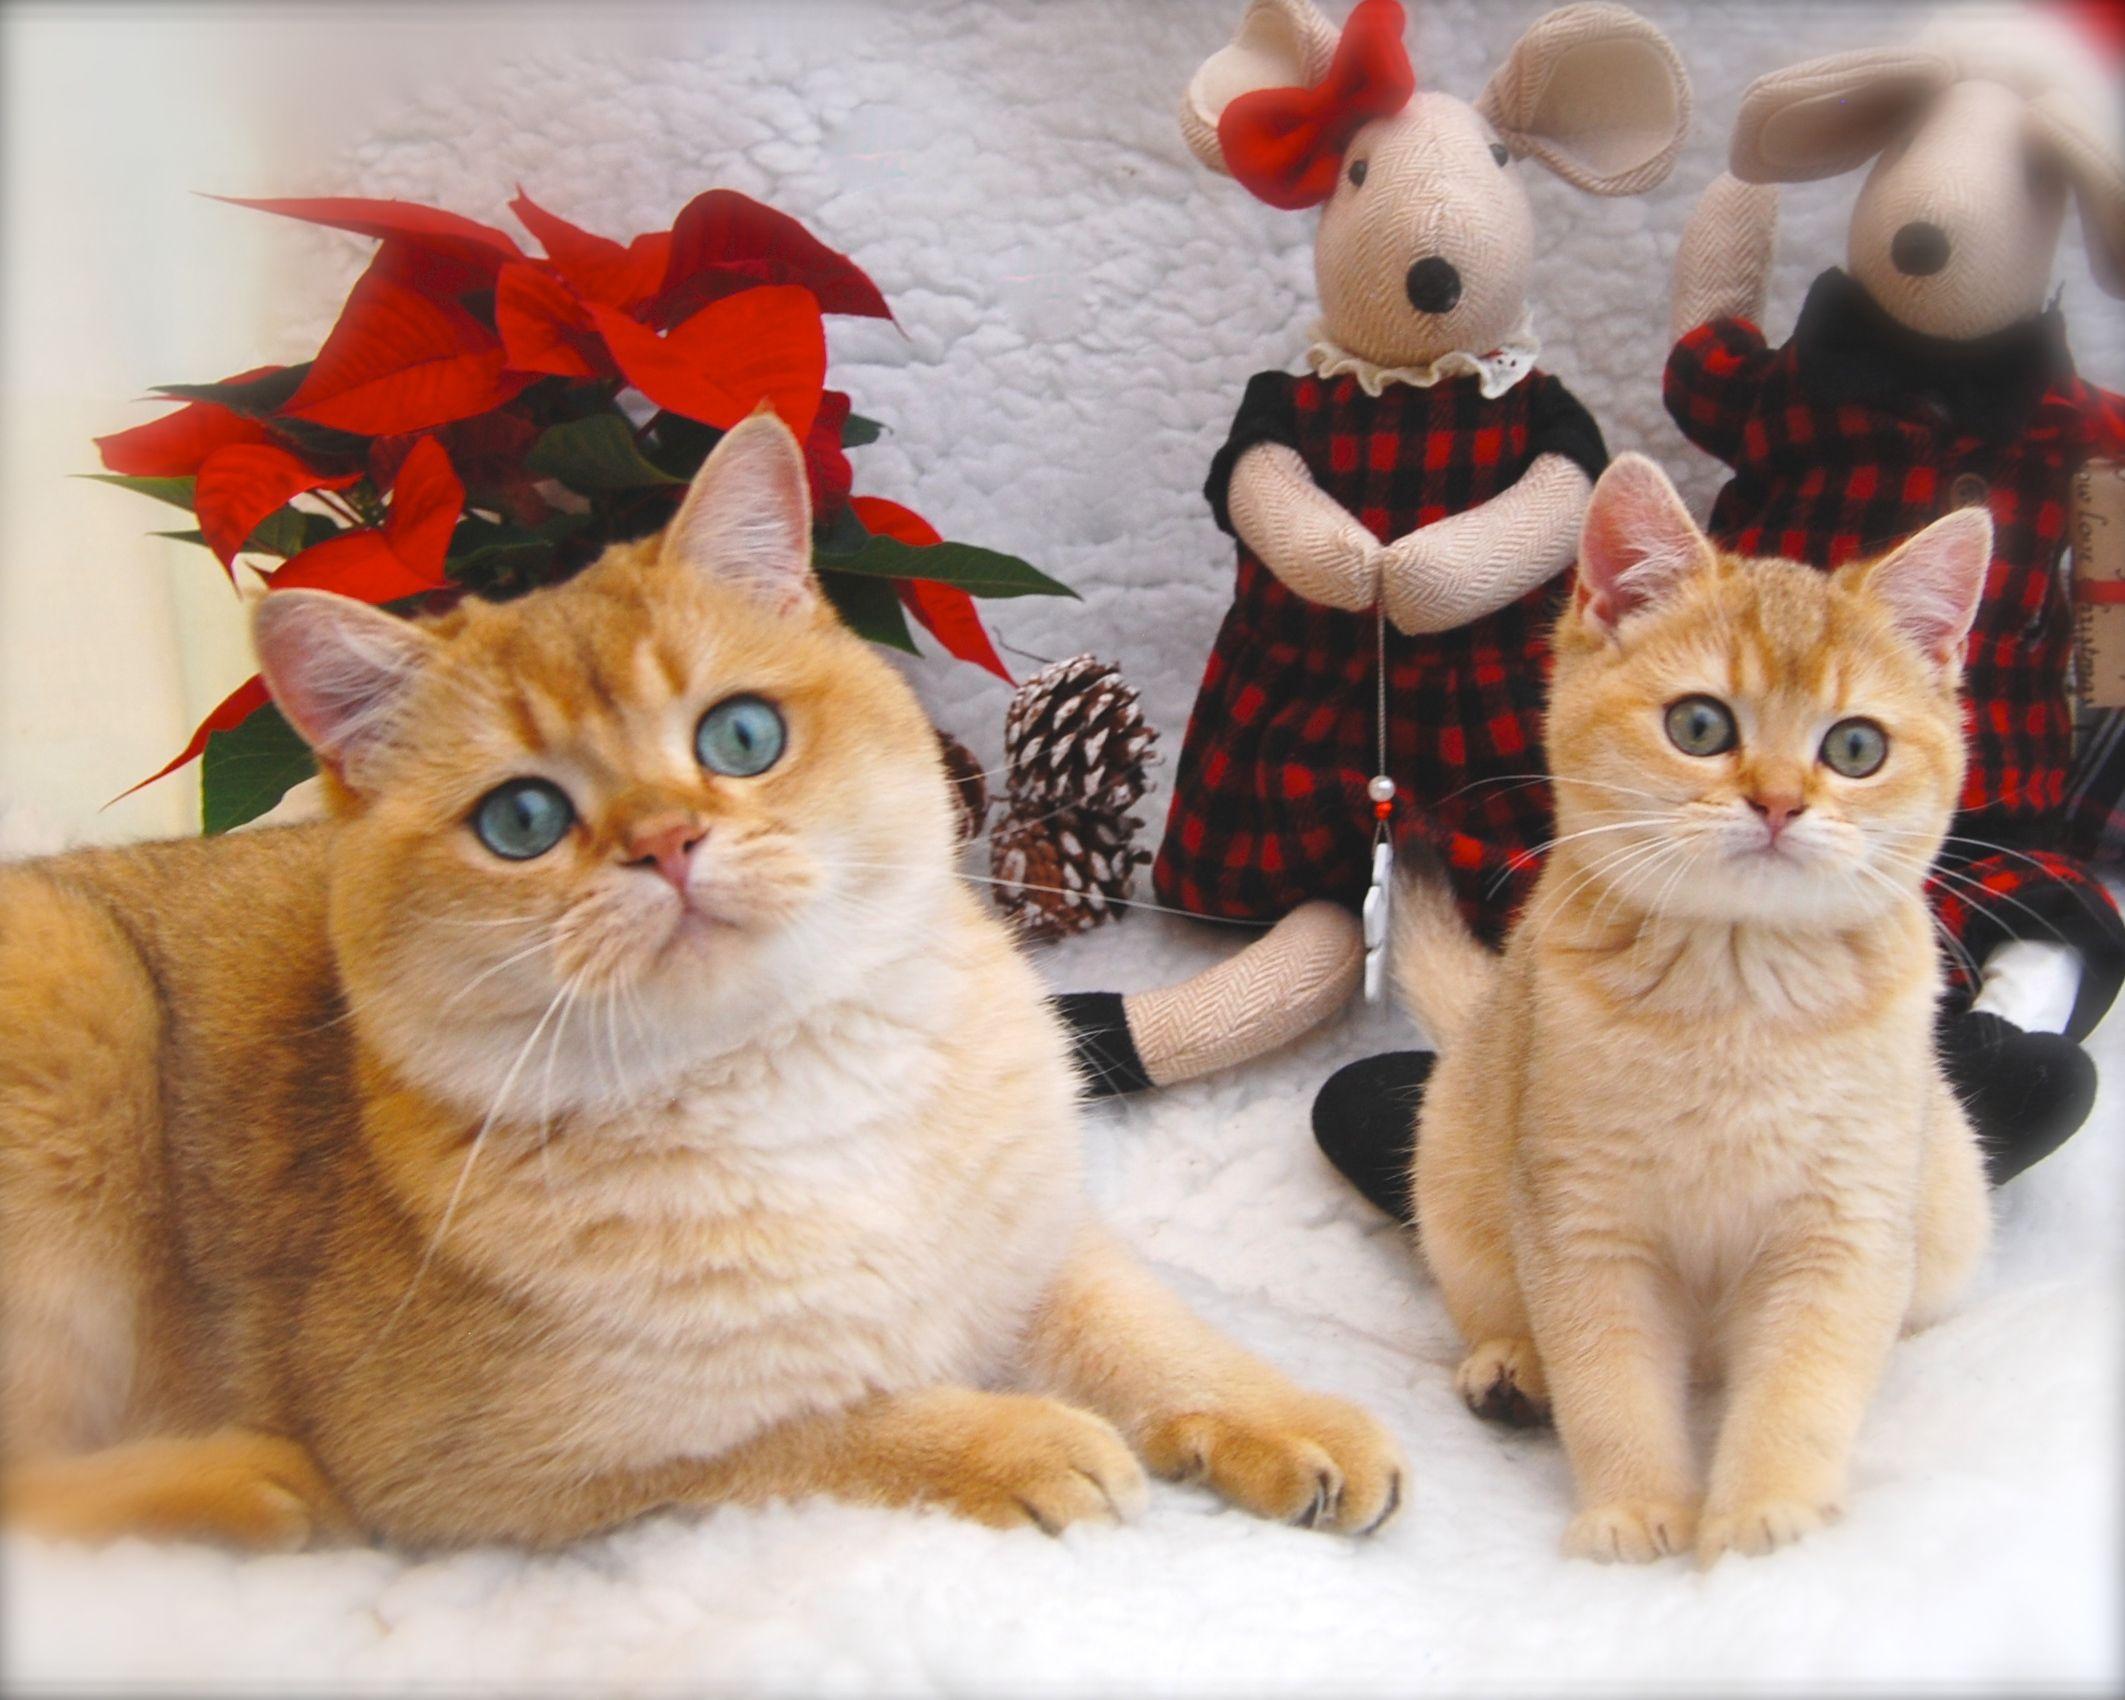 Merry Christmas From Belle Ayr Black Golden Shaded Ny11 British Shorthair Cat Kitten British Shorthair British Shorthair Cats Cats And Kittens